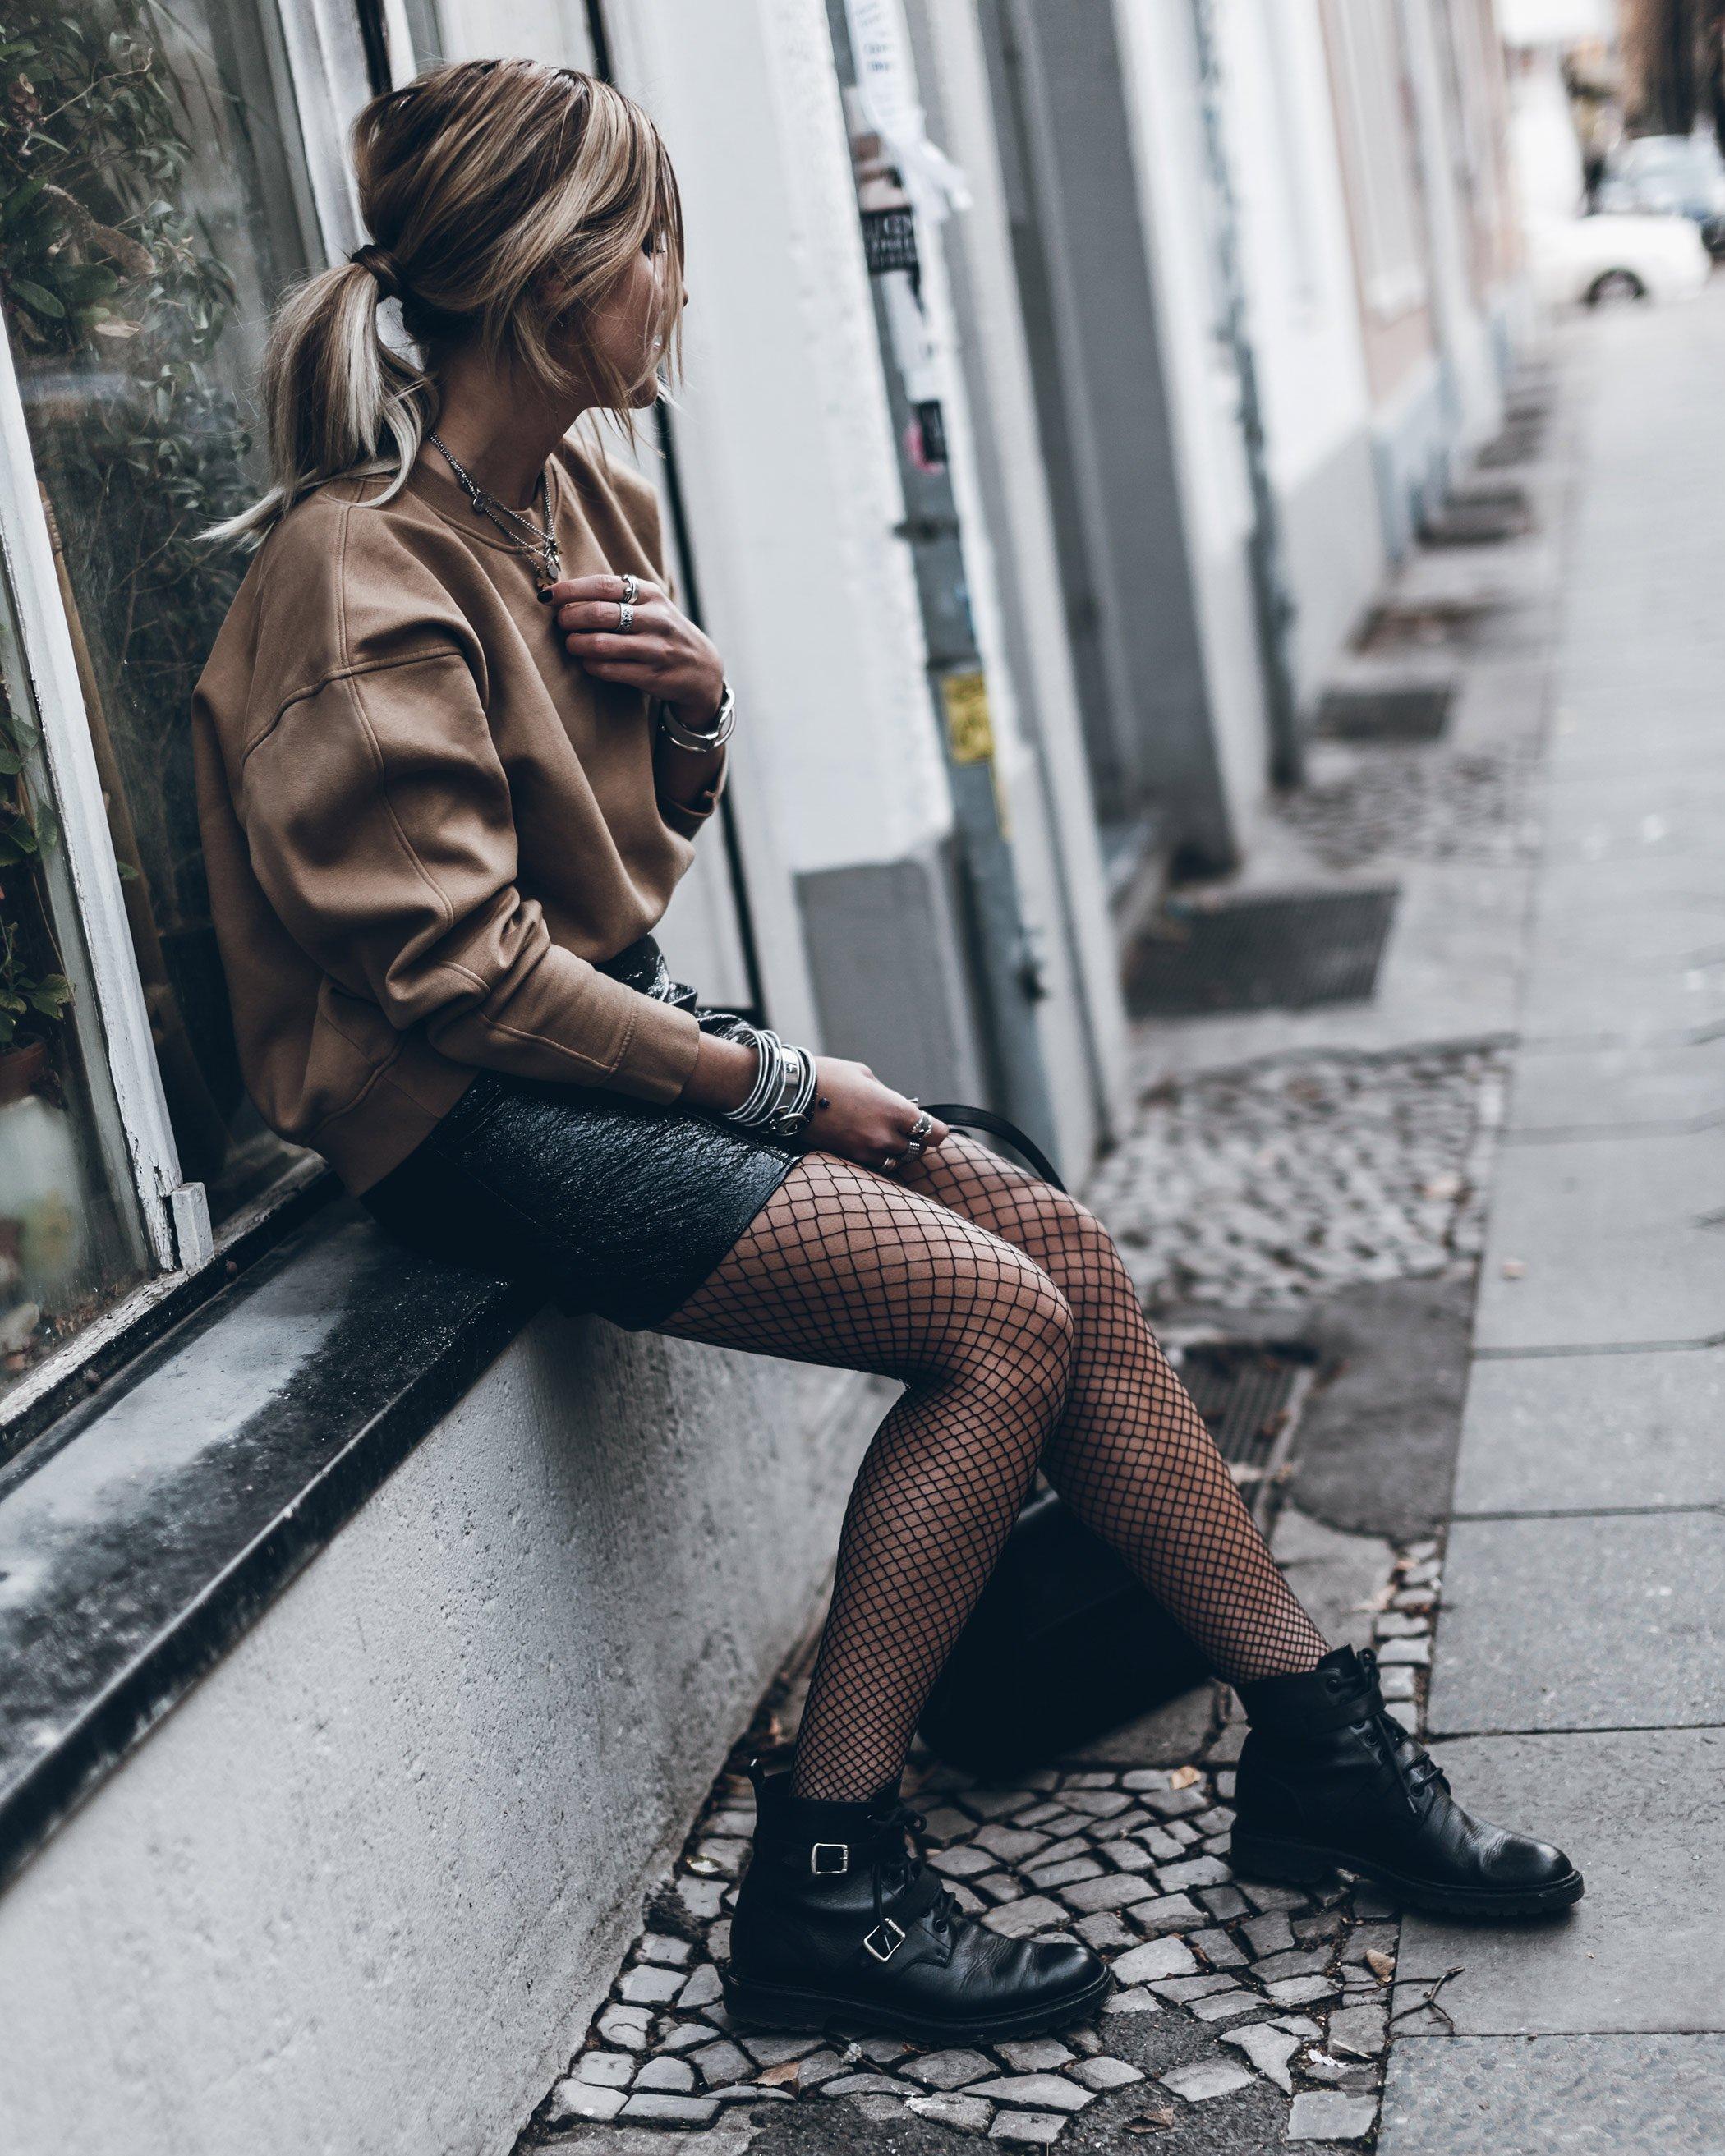 mikuta-patent-leather-skirt-9